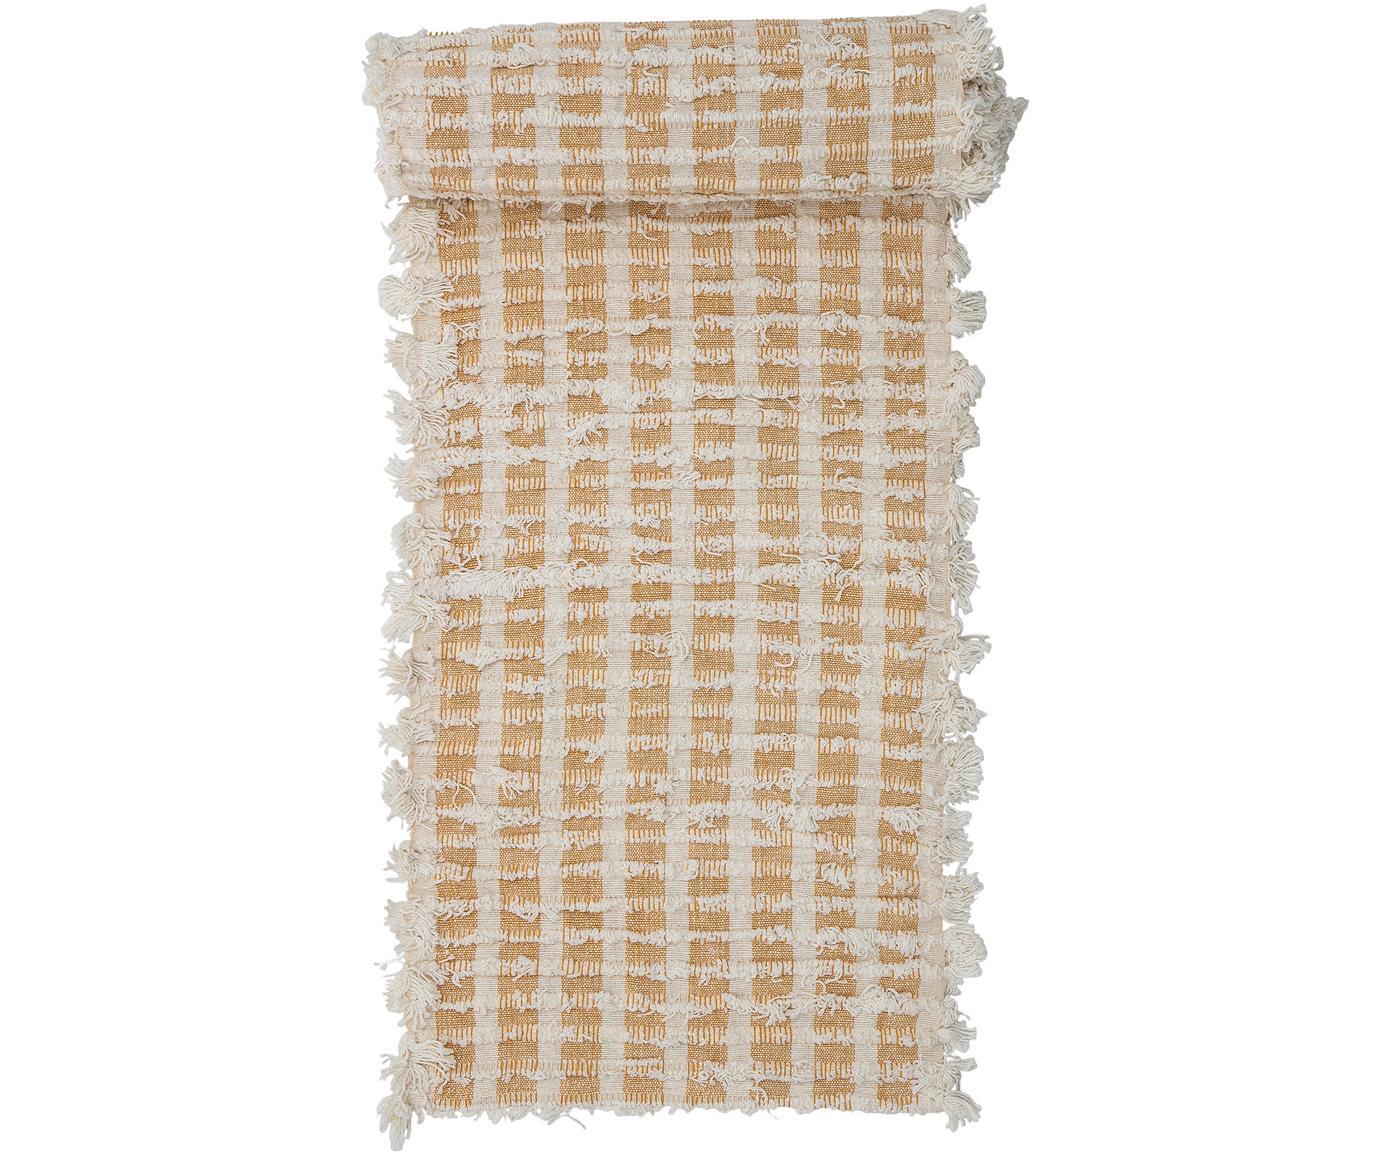 Runner Riala, 96% cotone, 4% altre fibre, Beige, crema, Larg. 35 x Lung. 180 cm